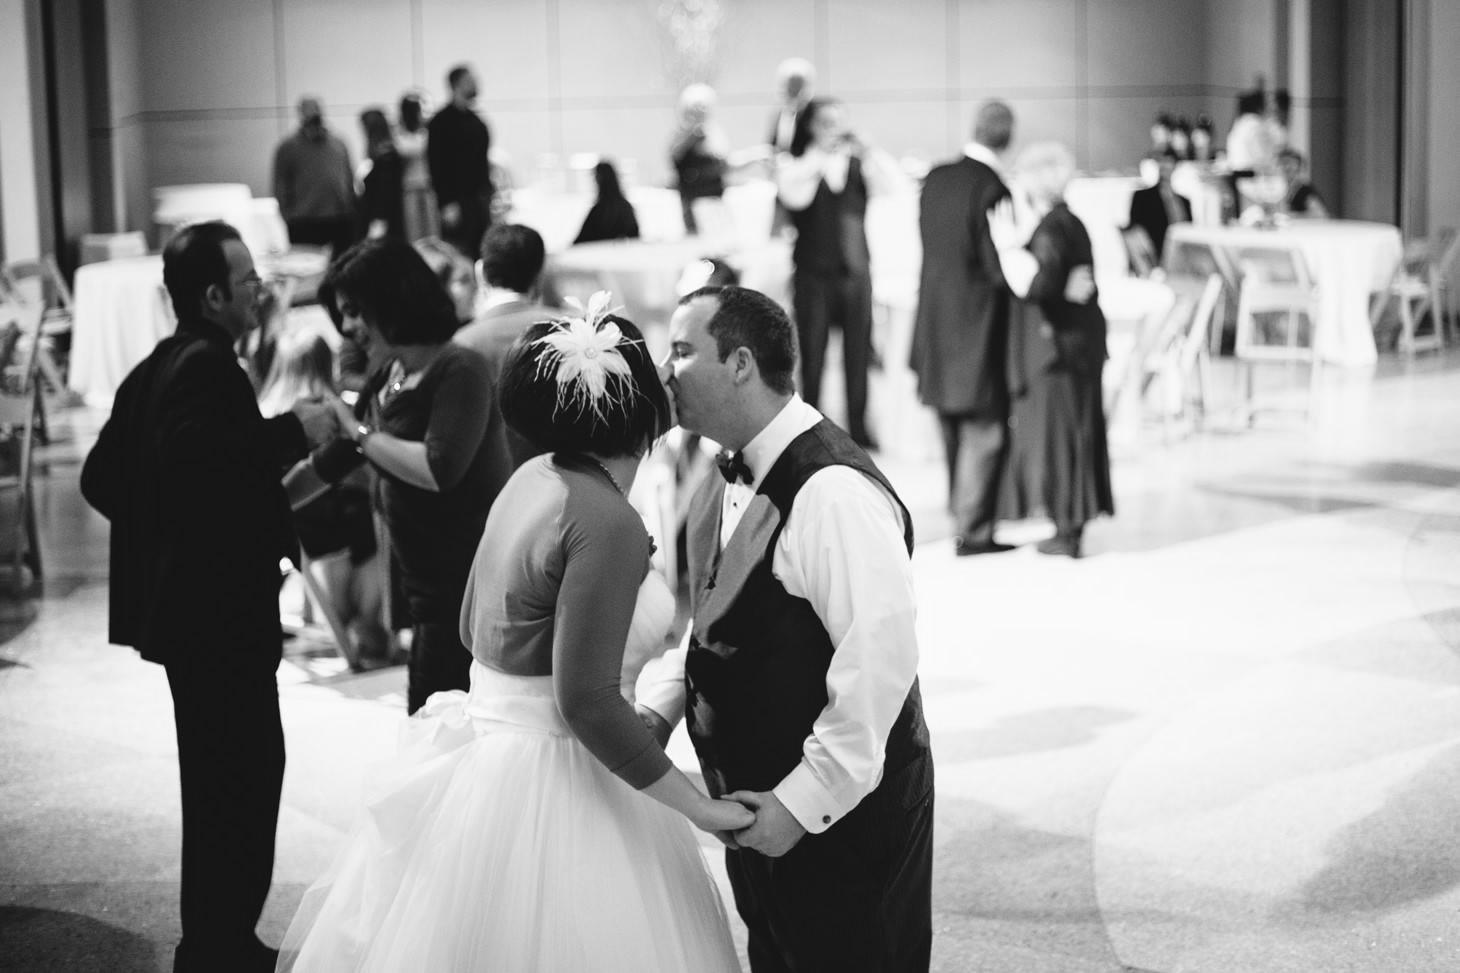 083-nyc-wedding-photographer-smitten-chickens-nj-montclair-art-museum.jpg